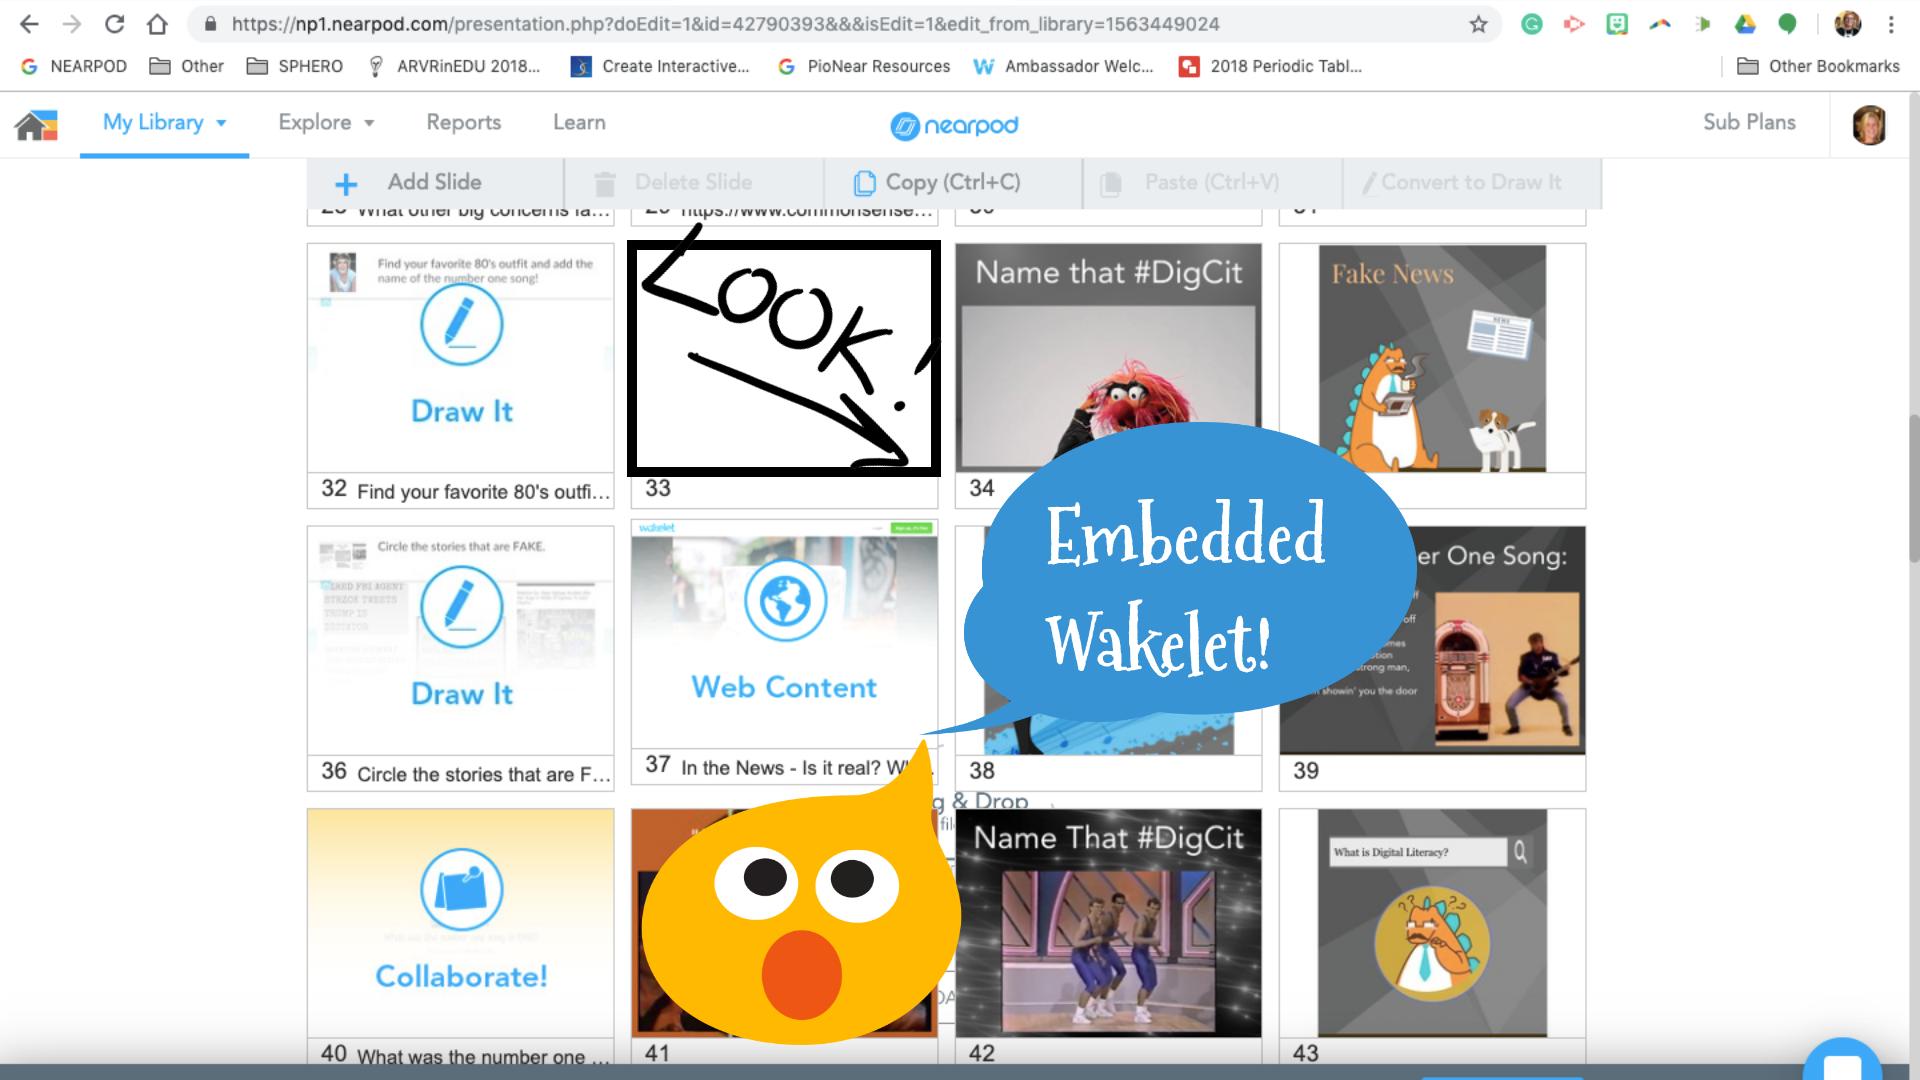 App-smashing Nearpod Wakelet embed